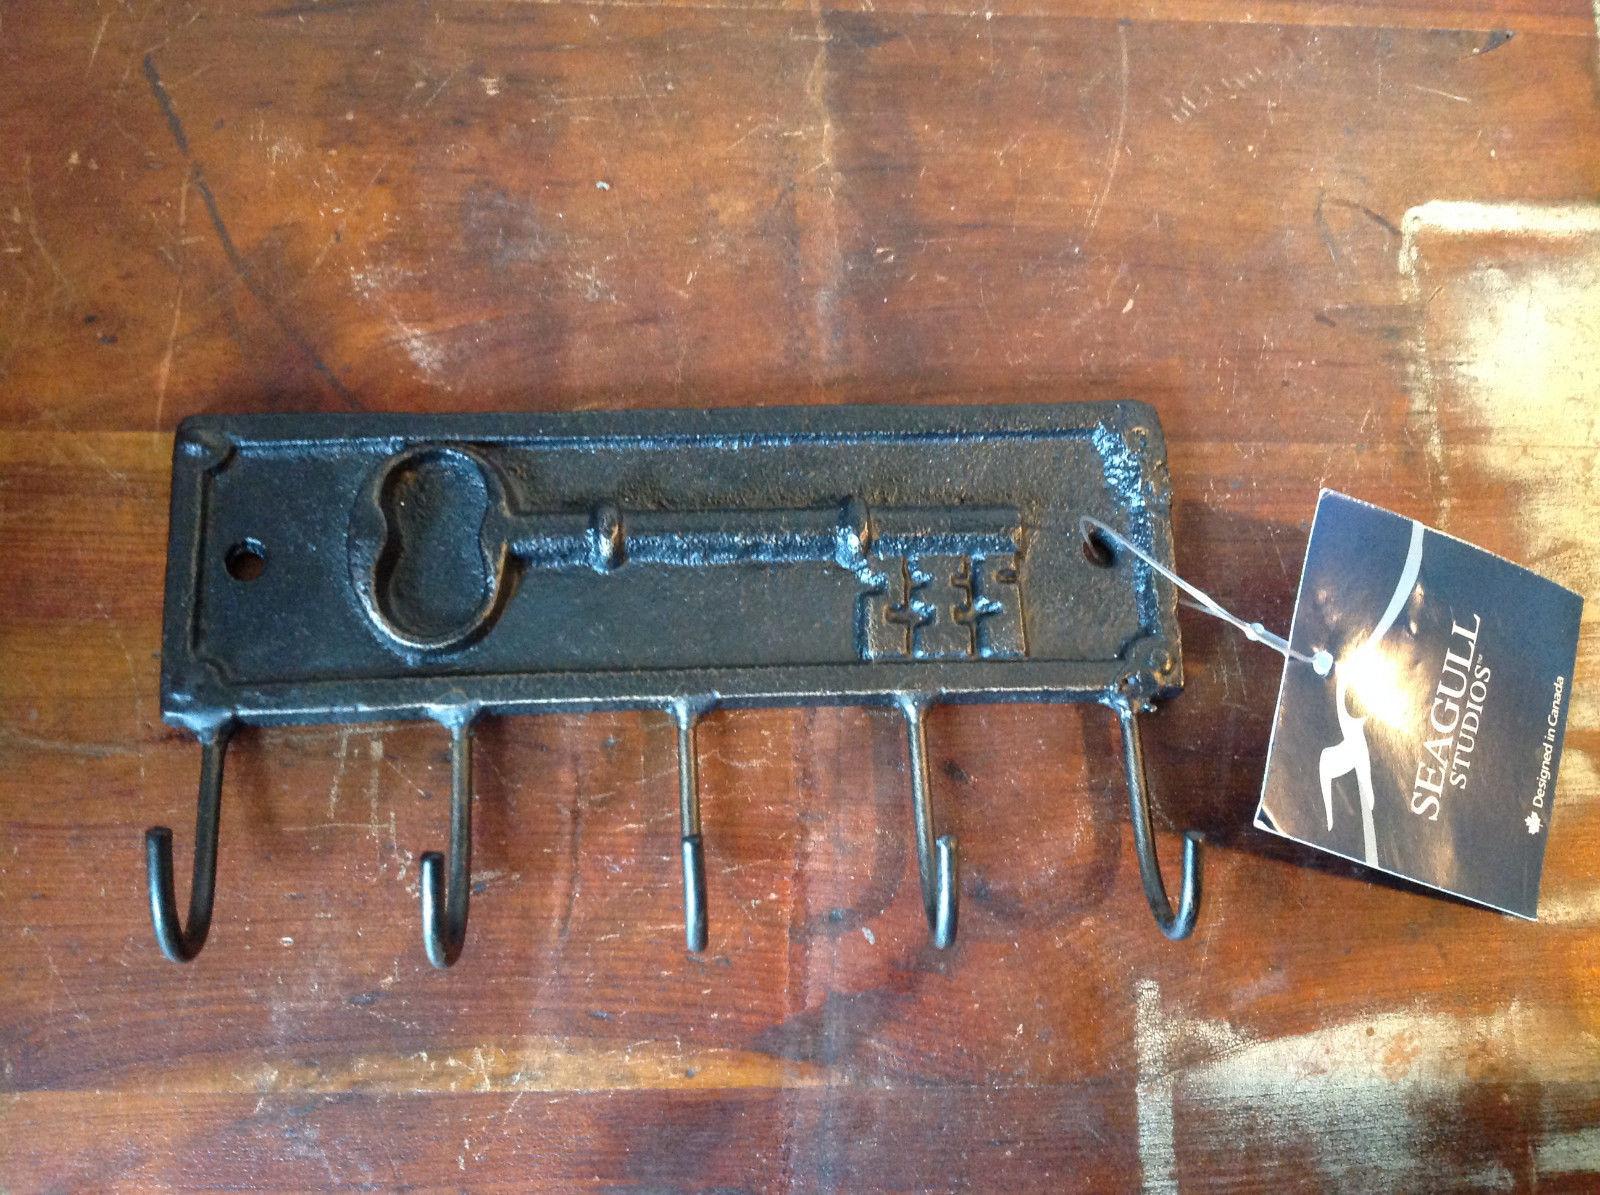 Metal Key Rack with Raised Key Design by Seagull Studies